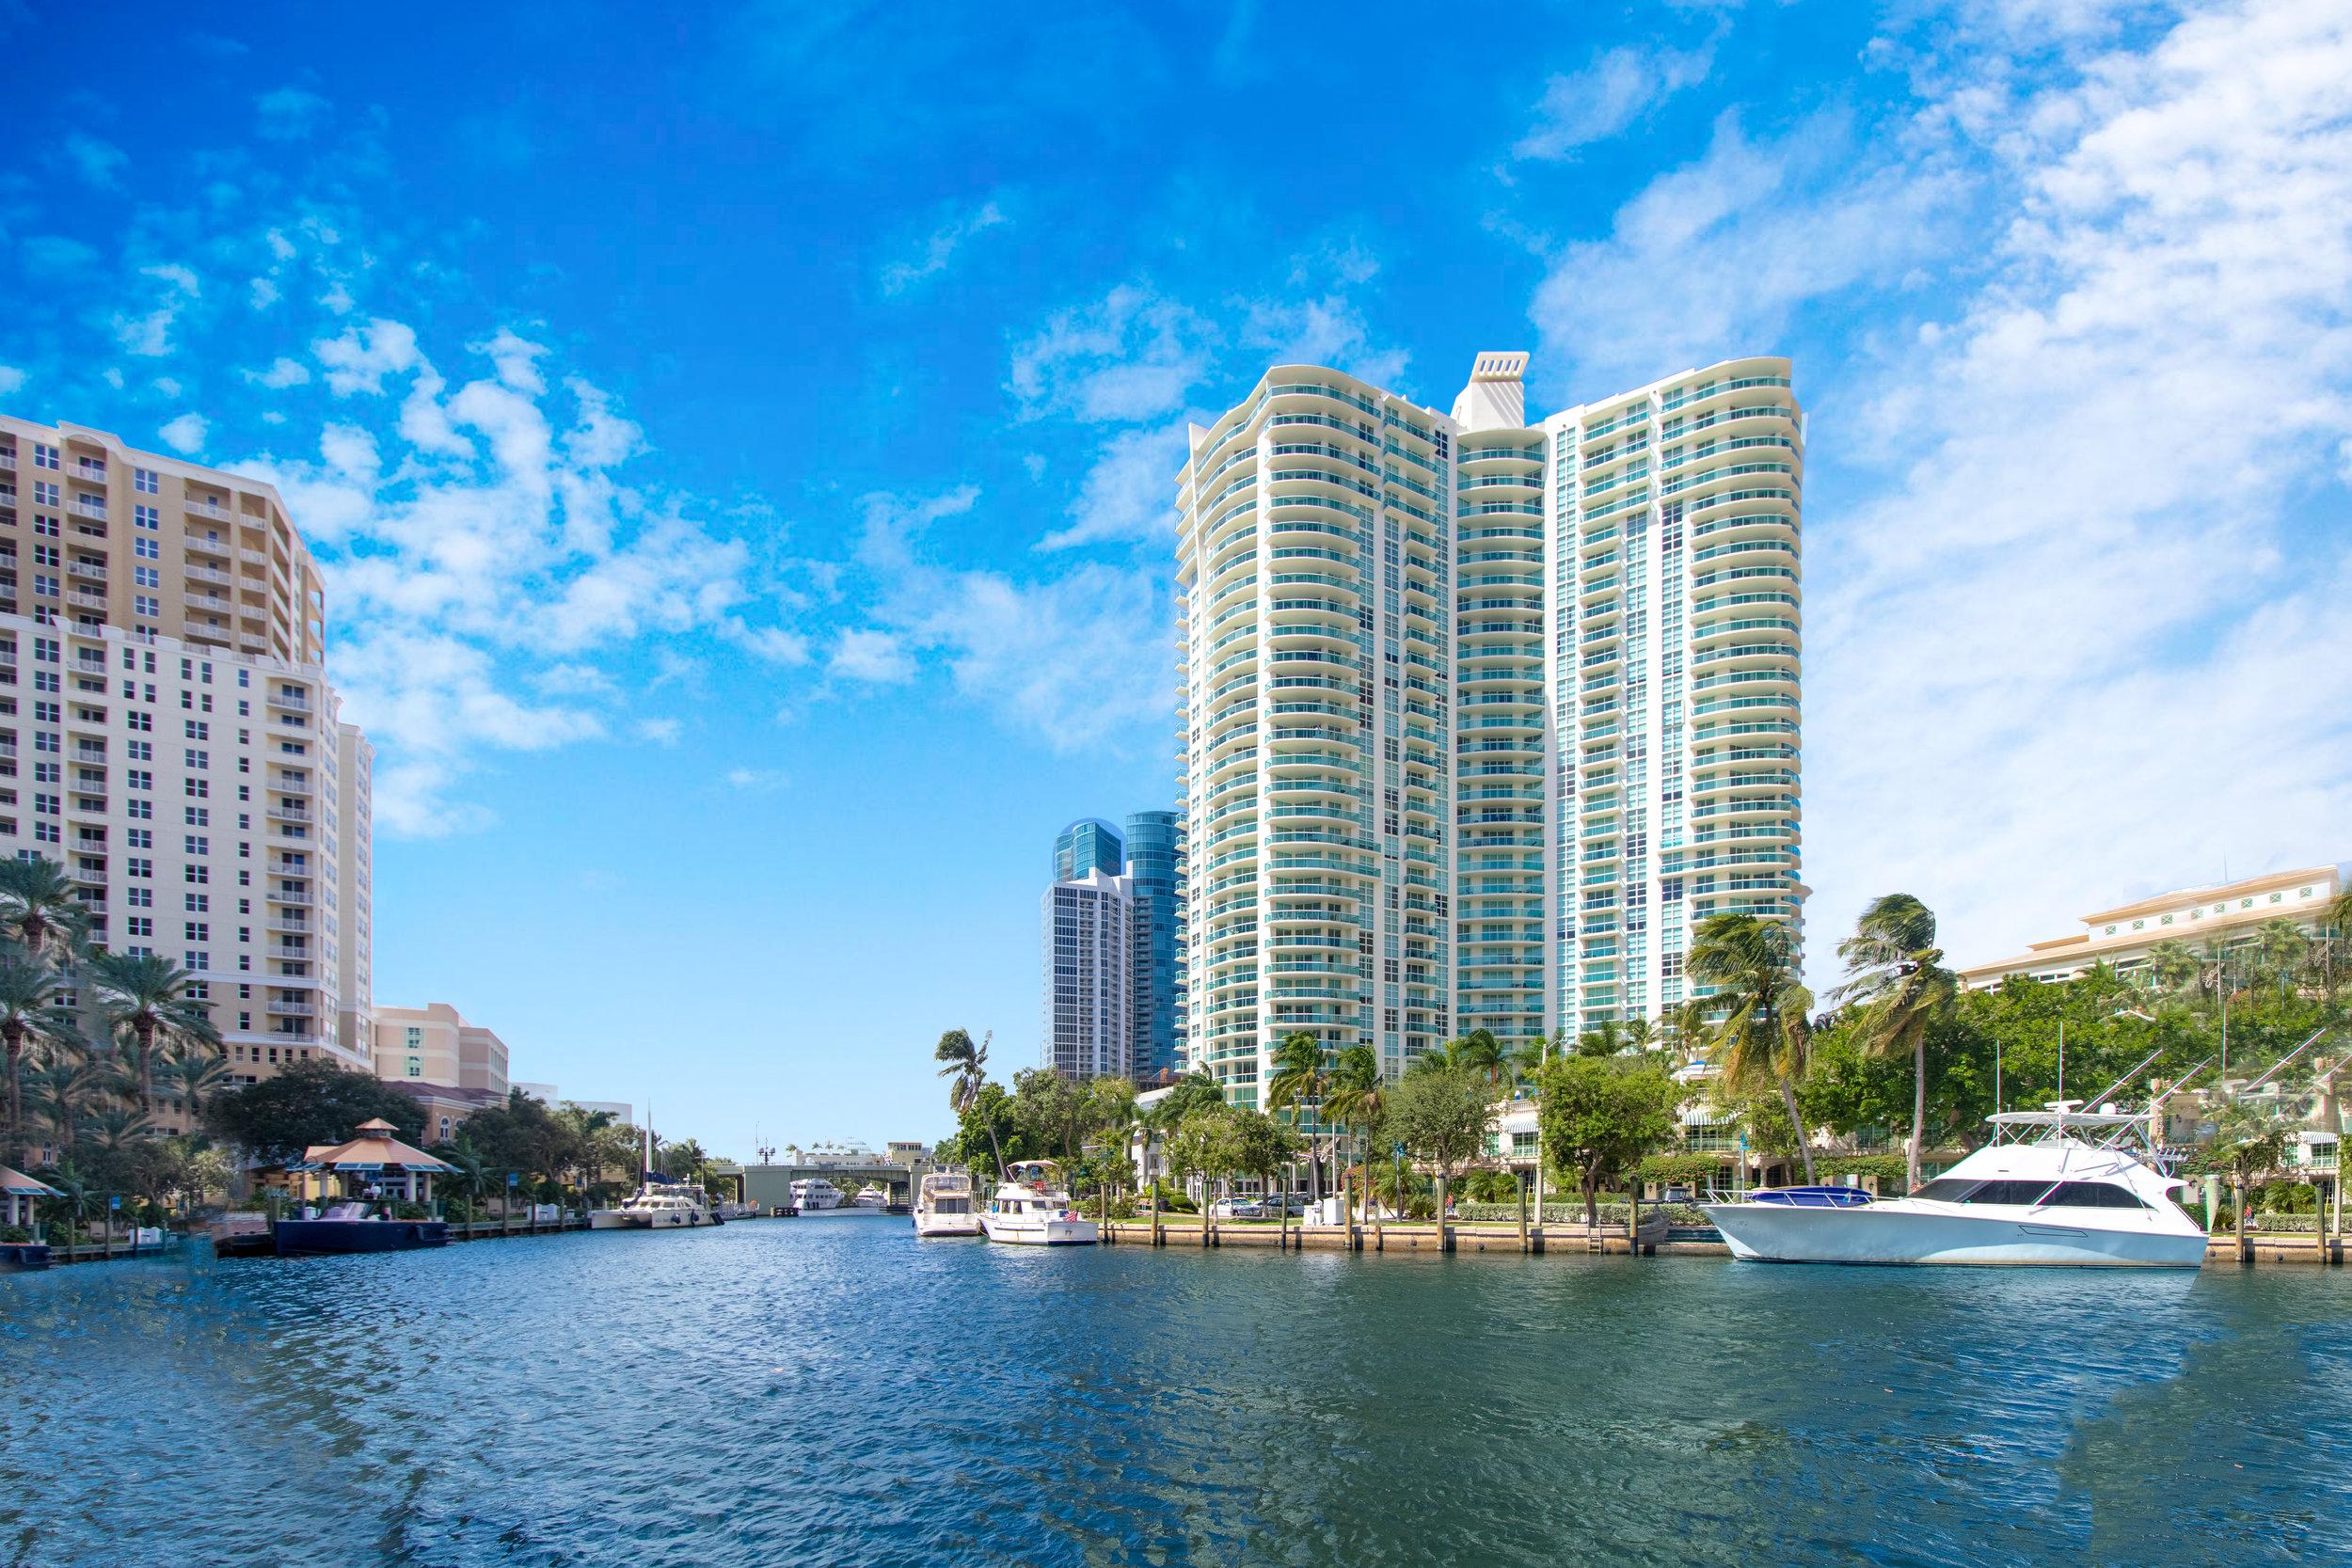 The WaterGarden at Las Olas Boulevard - 347 N New River Drive East Fort Lauderdale, FL 33301